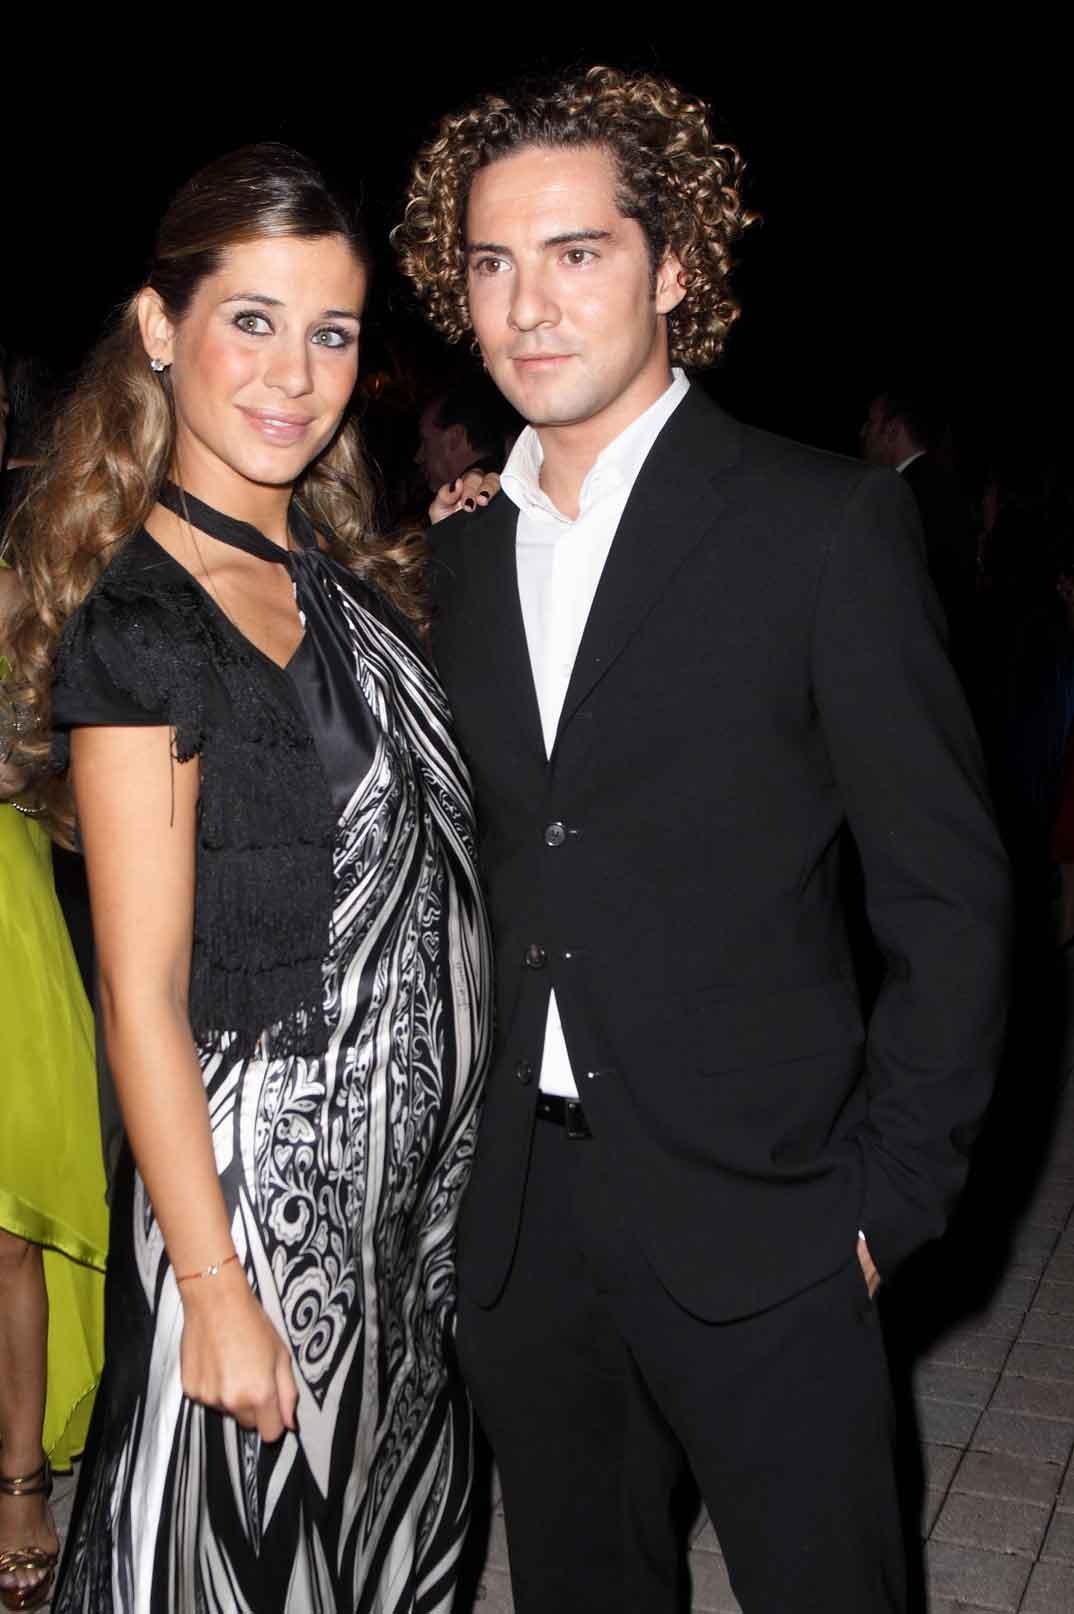 David Bisbal y Elena Tablada (foto archivo 2009)